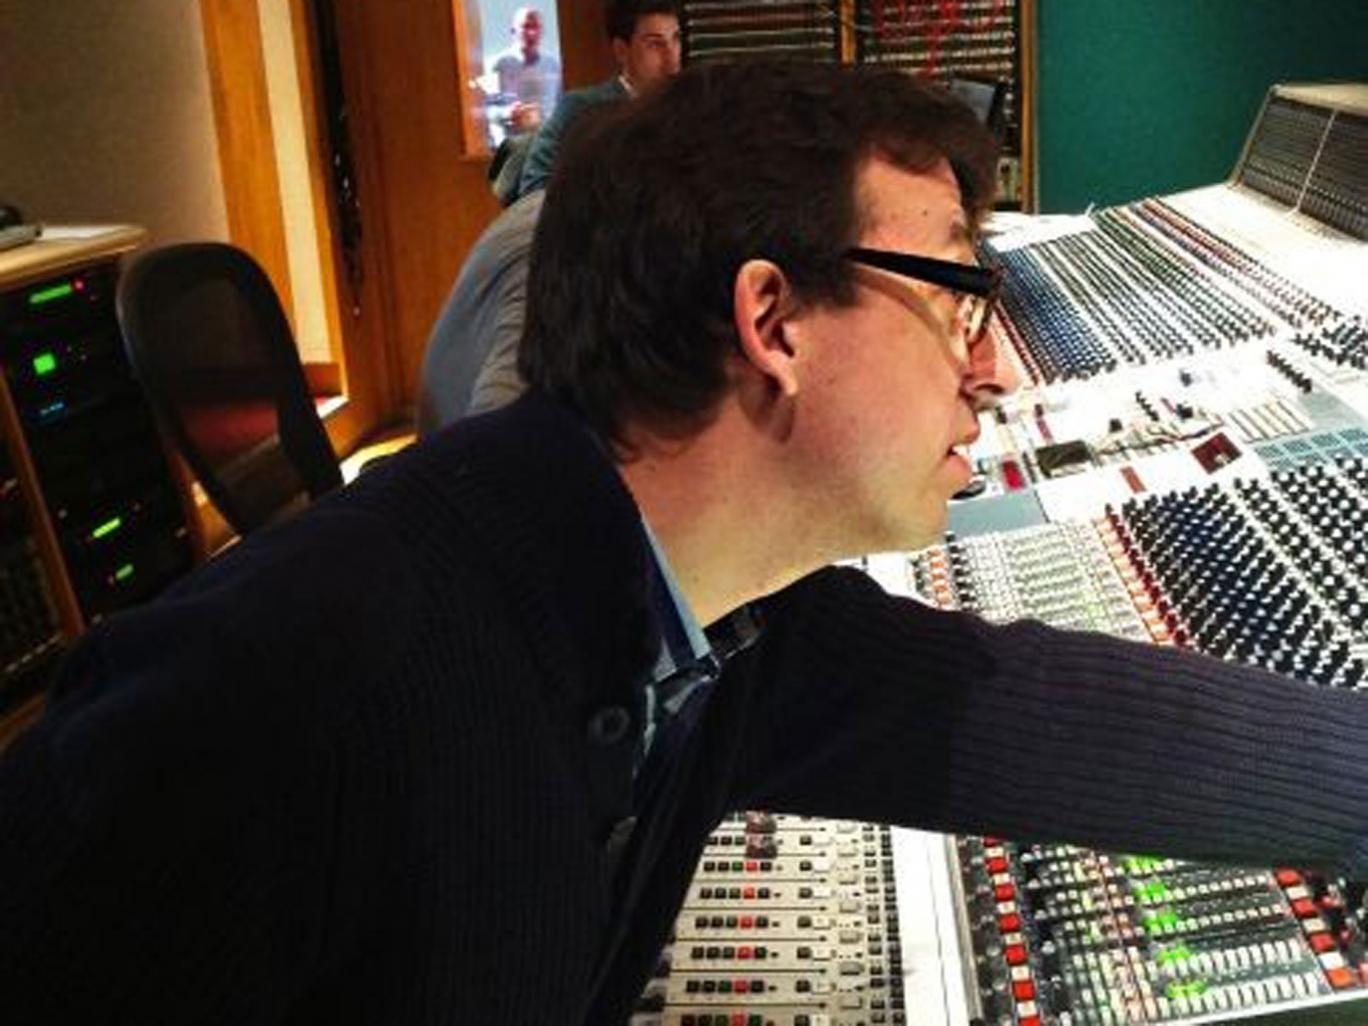 In tune: 'Alice's Adventures in Wonderland' composer Will Todd